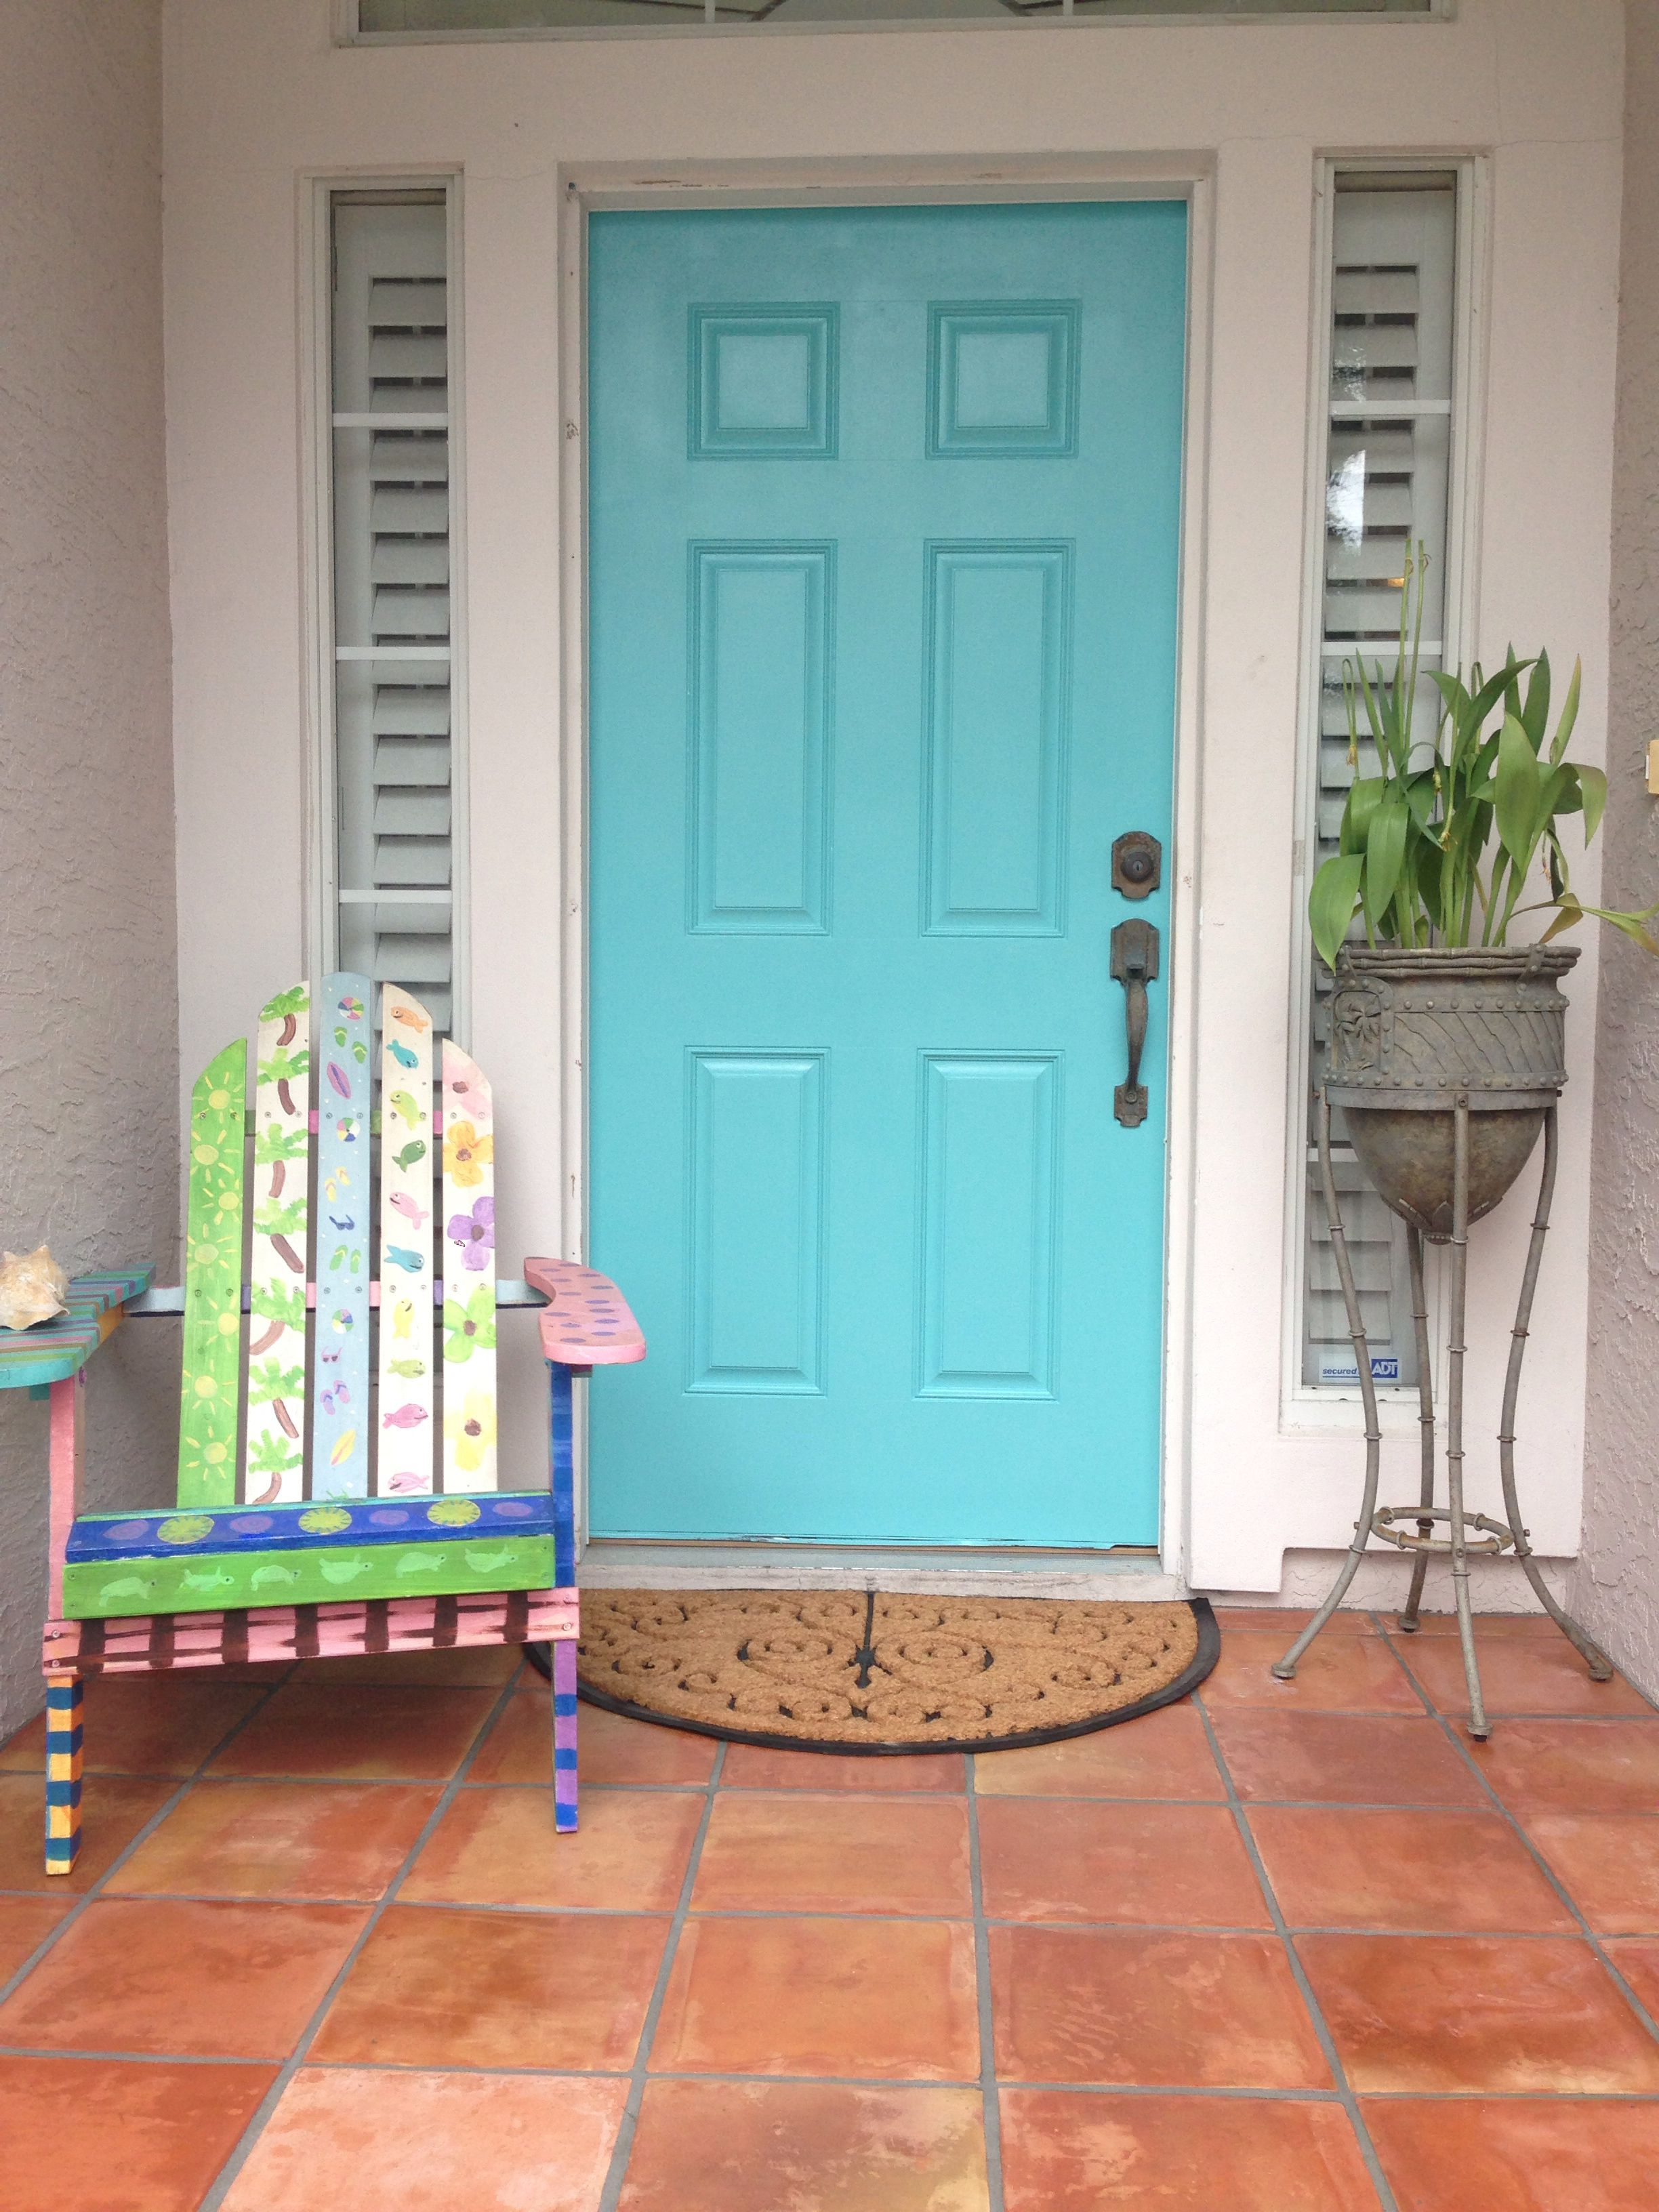 front door sherwin williams mariner for the home pinterest front doors doors and house. Black Bedroom Furniture Sets. Home Design Ideas